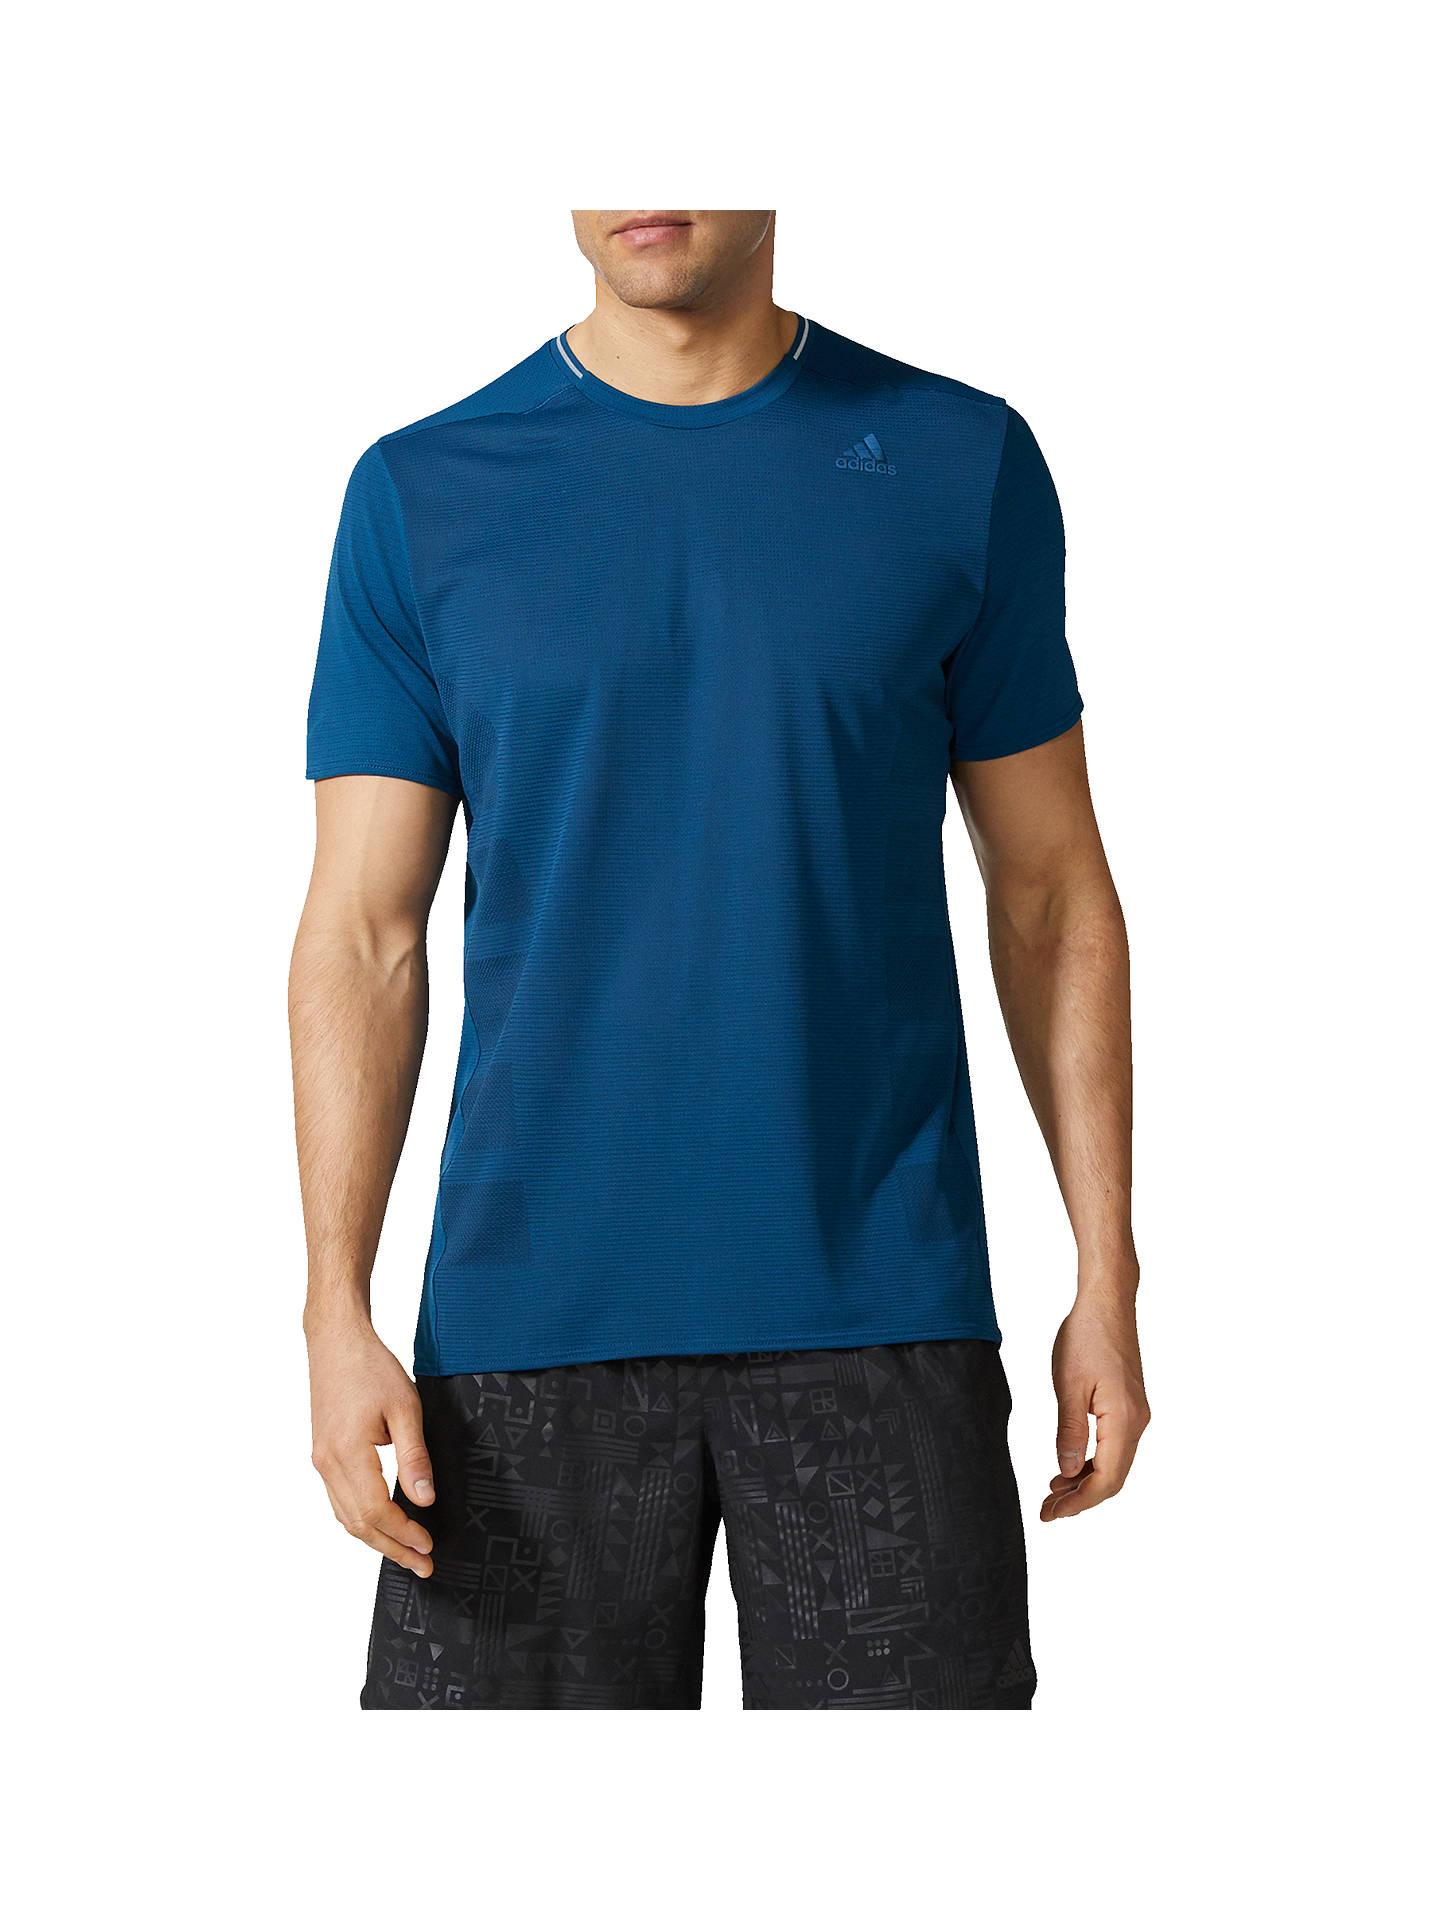 9f20ebe7e6f8f adidas Supernova Short Sleeve Running T-Shirt at John Lewis   Partners